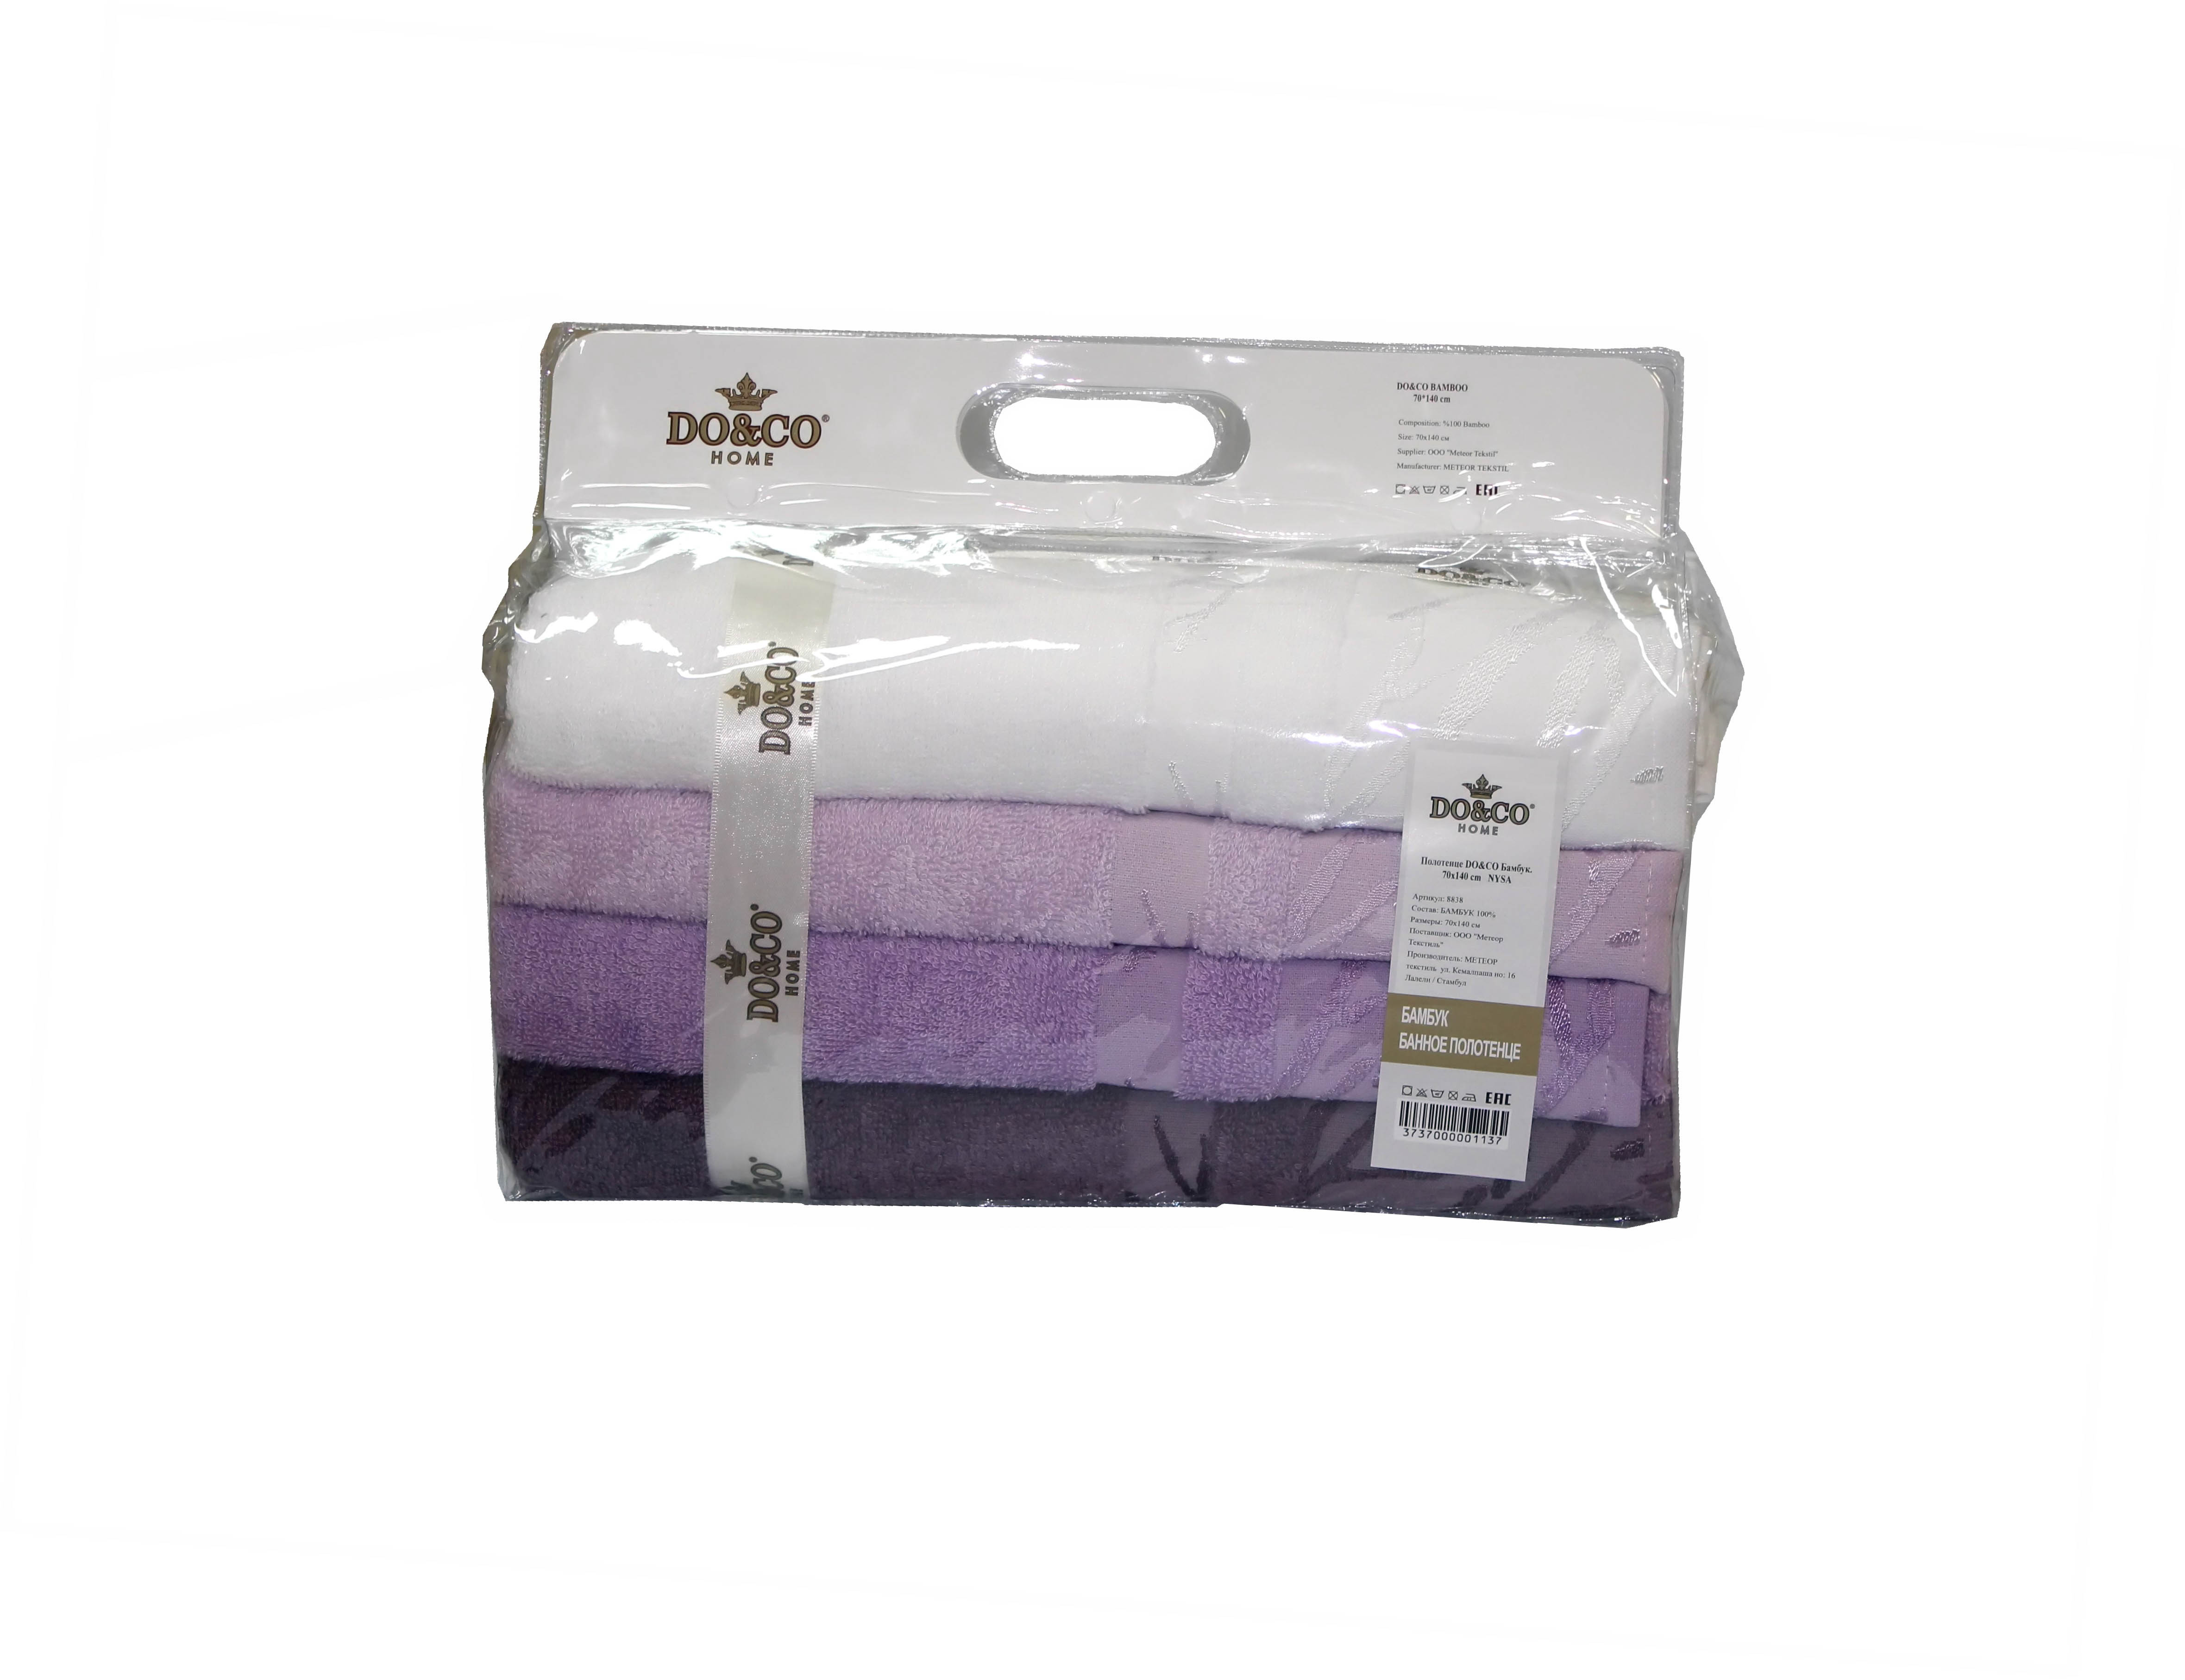 Полотенца DO'n'CO Набор Полотенец Nysa (70х140 см - 4 шт) полотенца кухонные la pastel набор полотенец 4 предмета из микрофибры 30х30